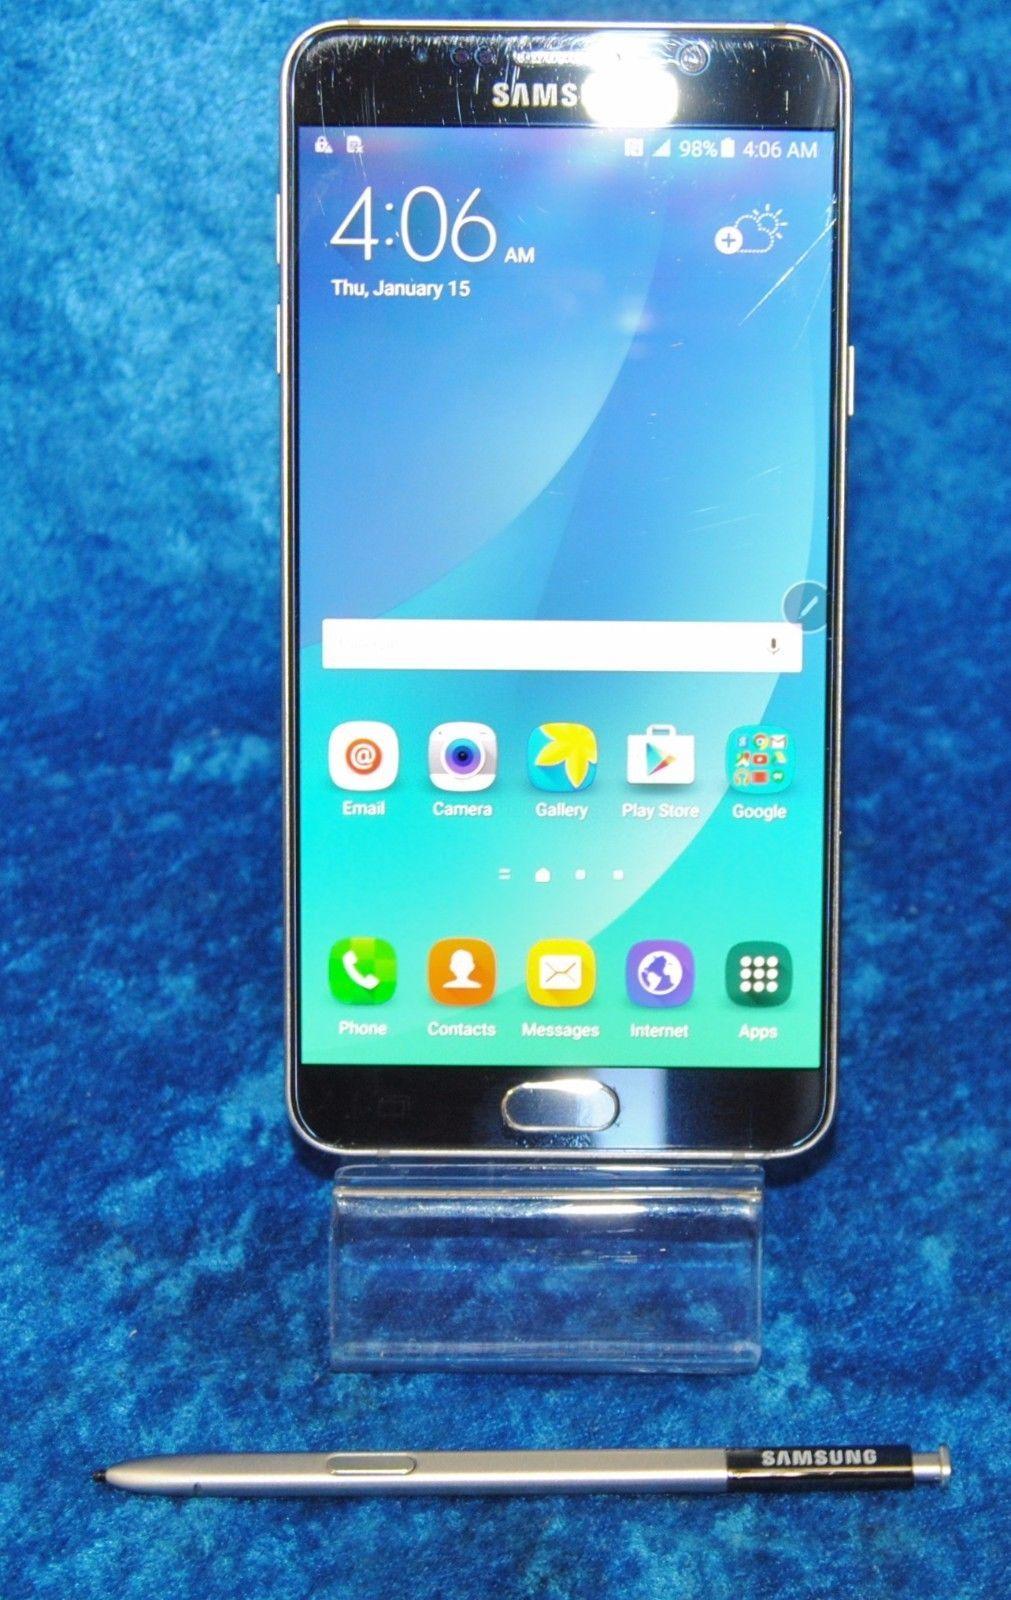 "Samsung Galaxy Note5 - 32 GB T-Mobile & Wi-Fi 16MP 5.7"" Black SM-N920T Clean ESN https://t.co/sFzYV603Ty https://t.co/qHxVuat2Y0"